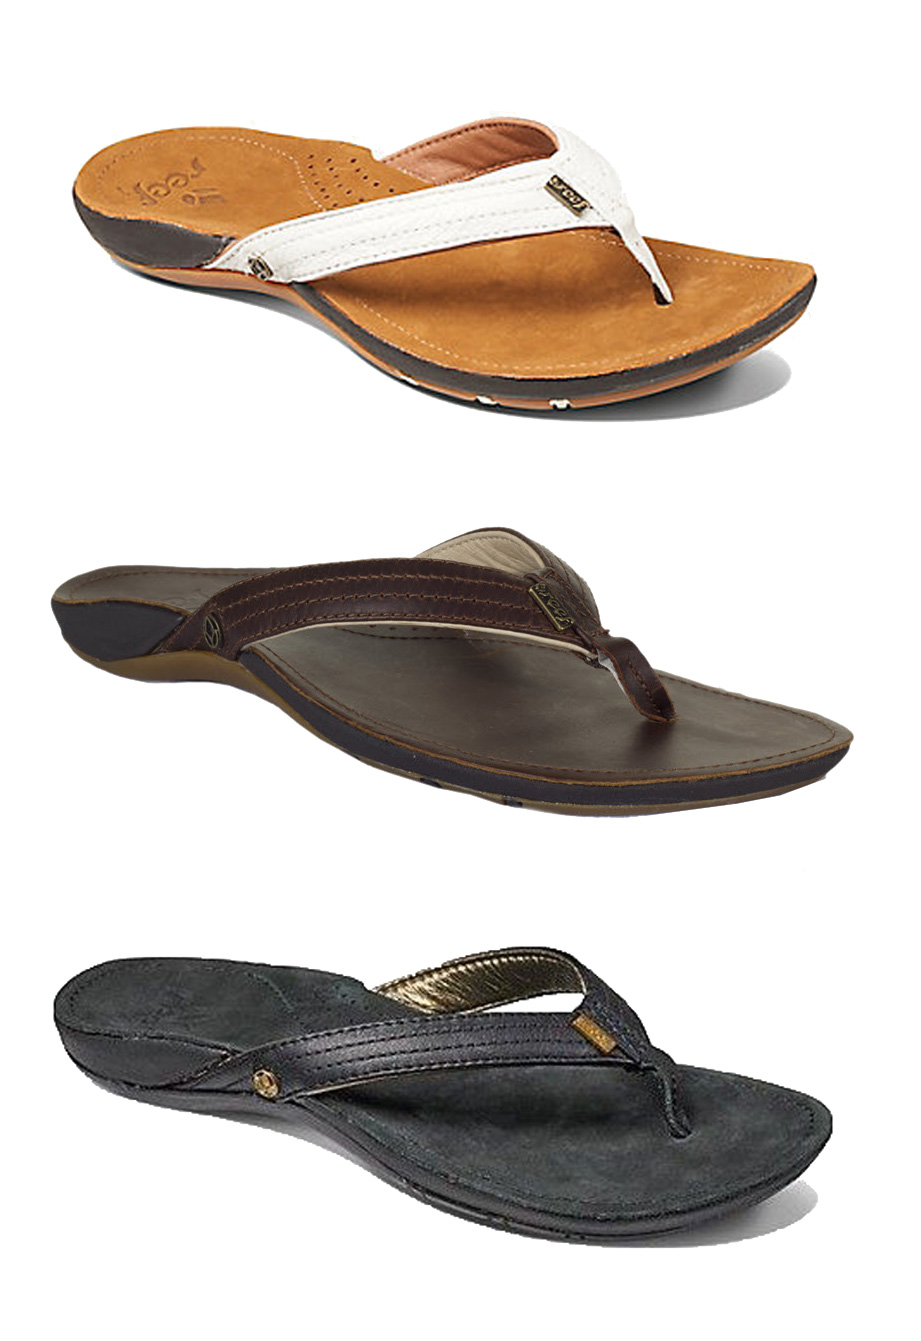 aff73772f8e5 Details about Reef Womens Sandal - Miss J-Bay - Flip Flops